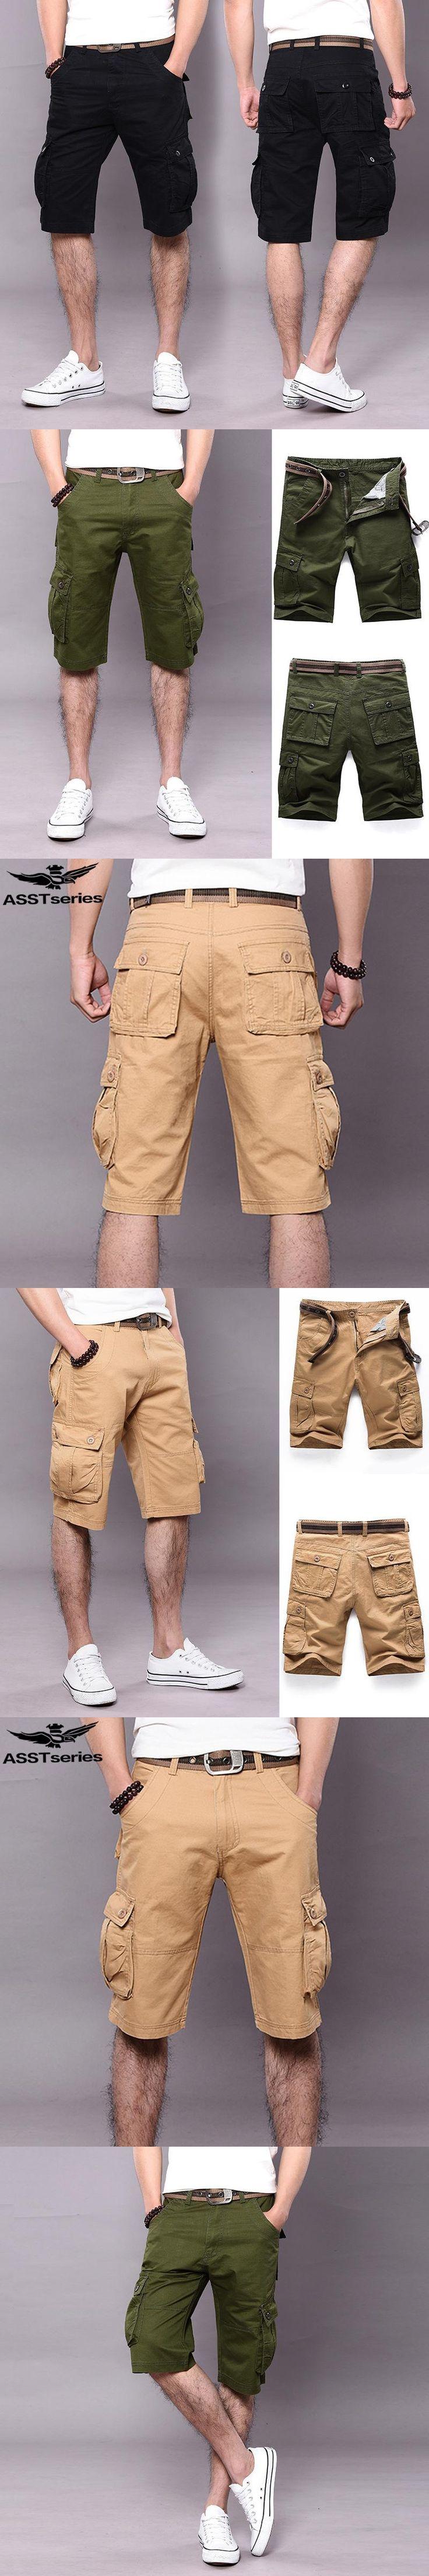 Men's Tactical Shorts Cargo Military Shorts For Men Army Jeans Short Bermuda Cargo Masculina Pantalones Cortos Hombre.AA03